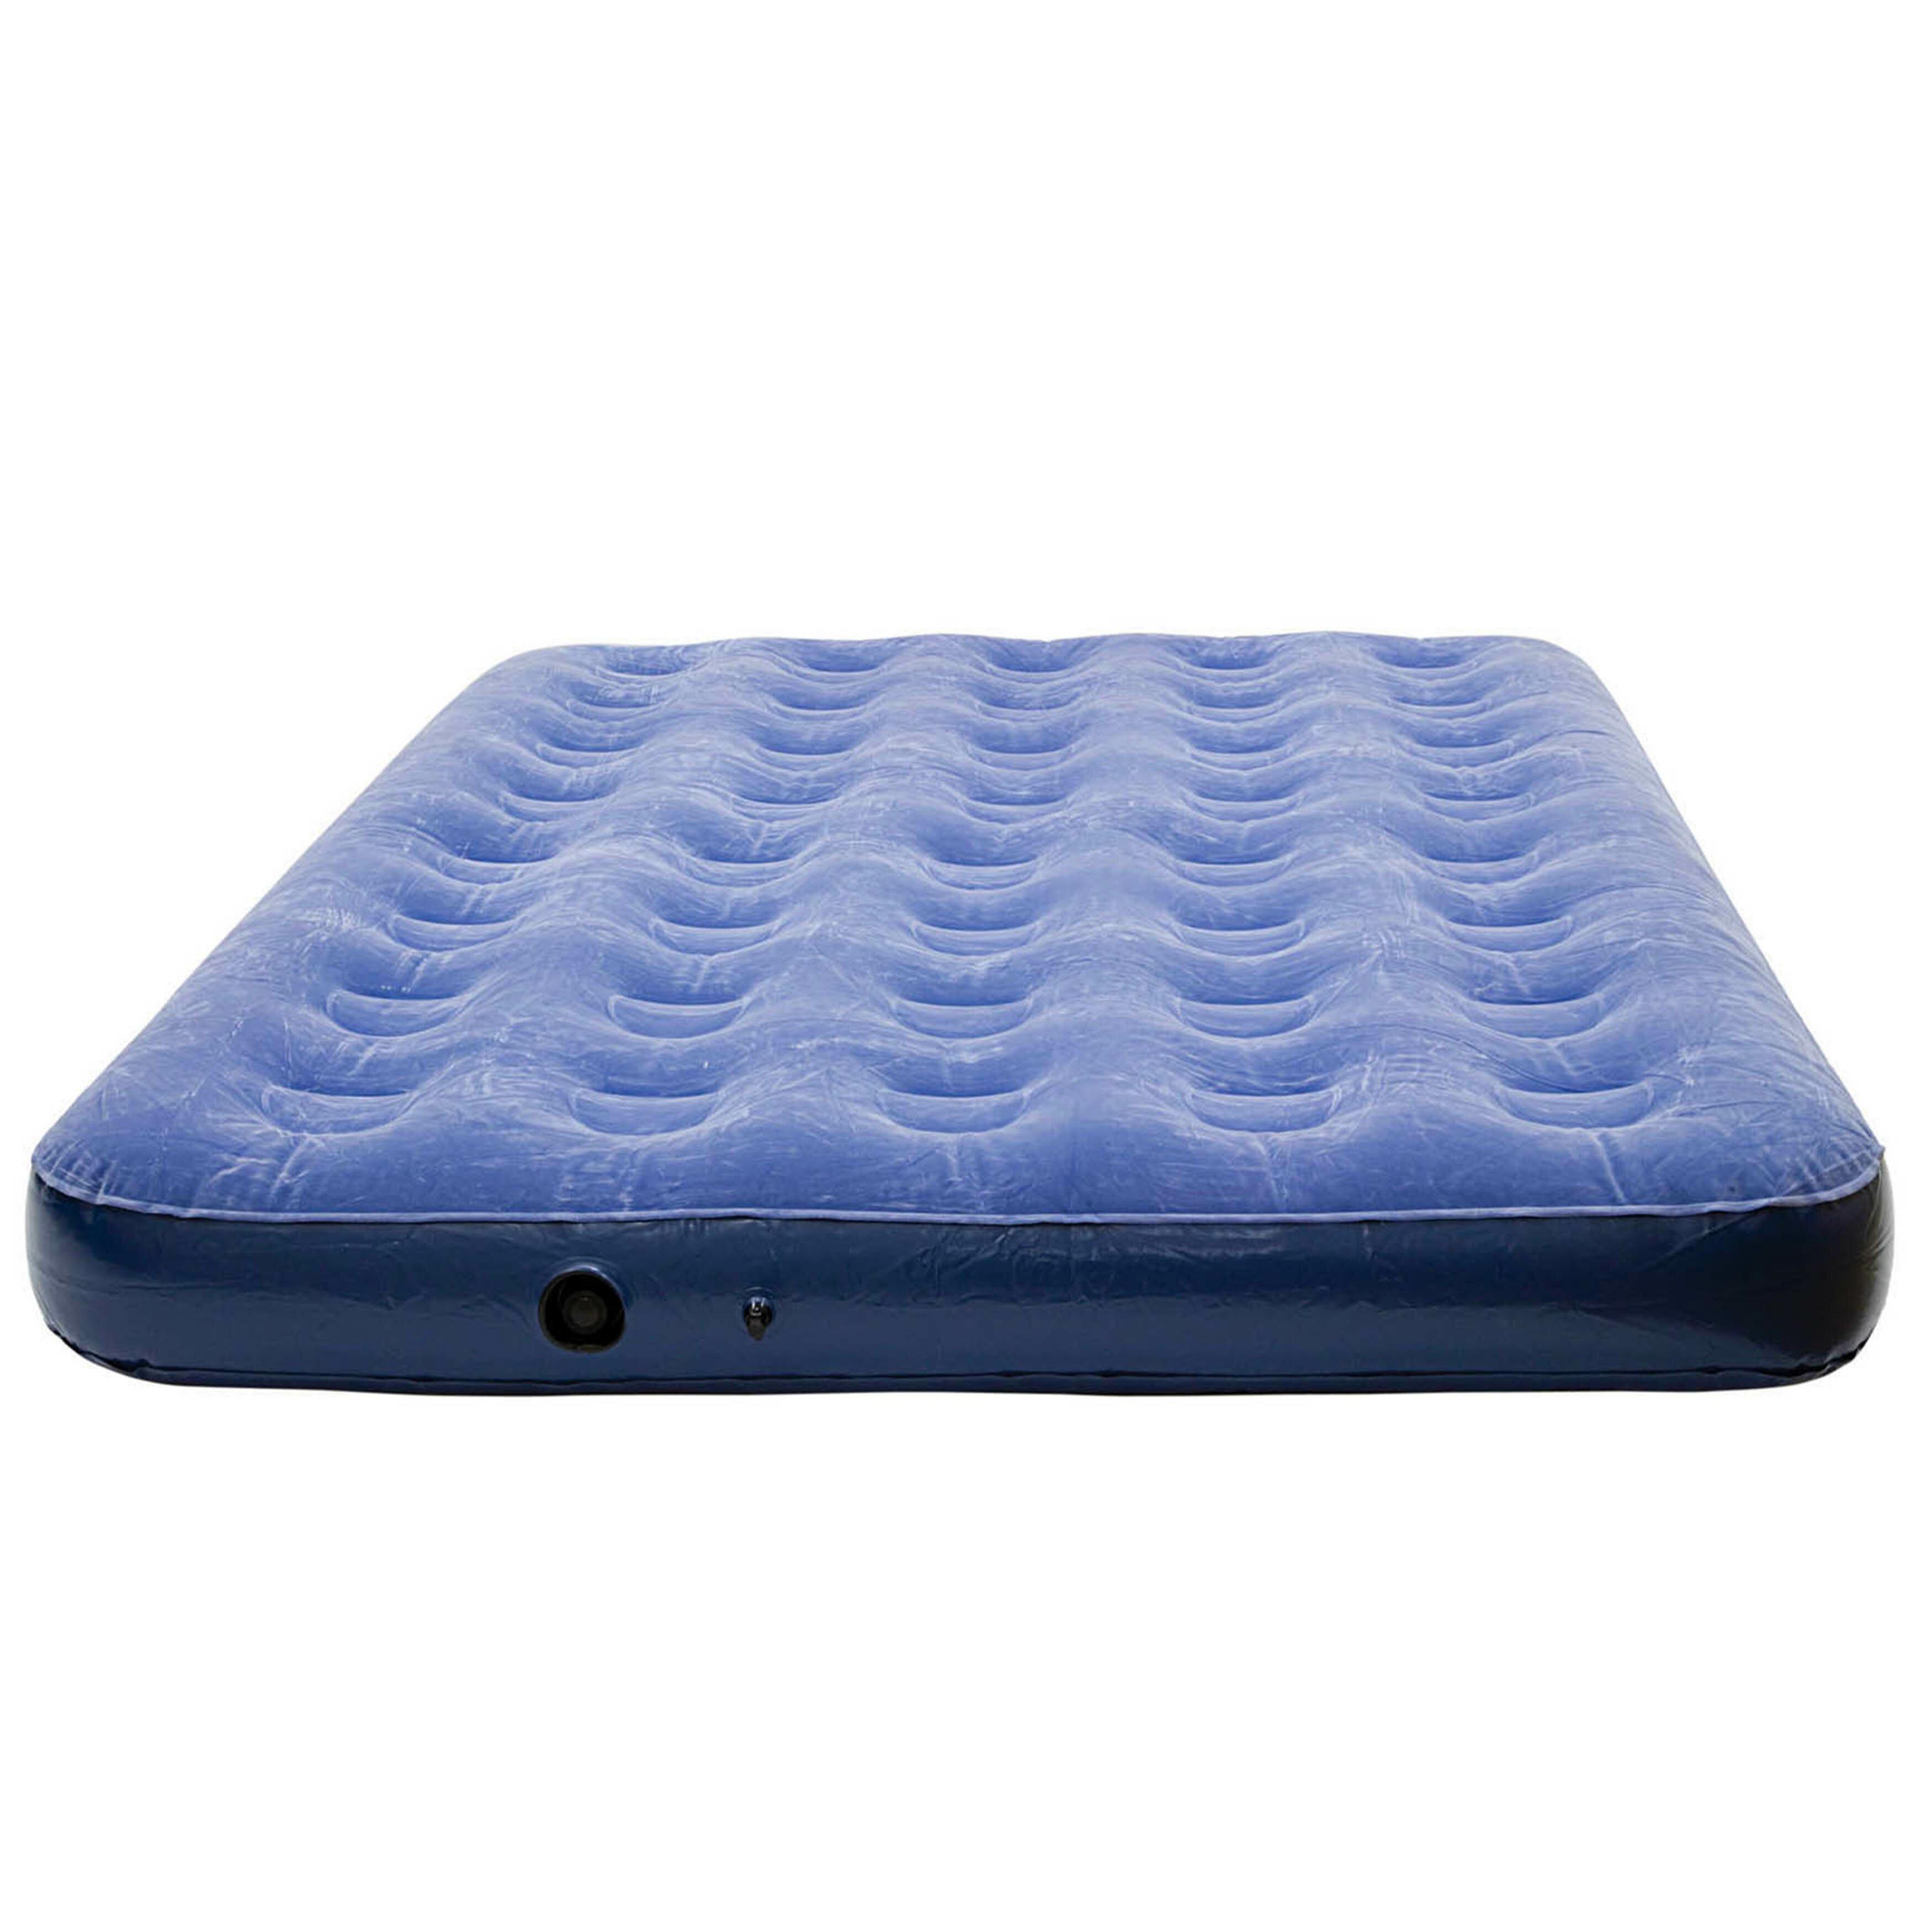 Pure Comfort Full Size Air Mattress